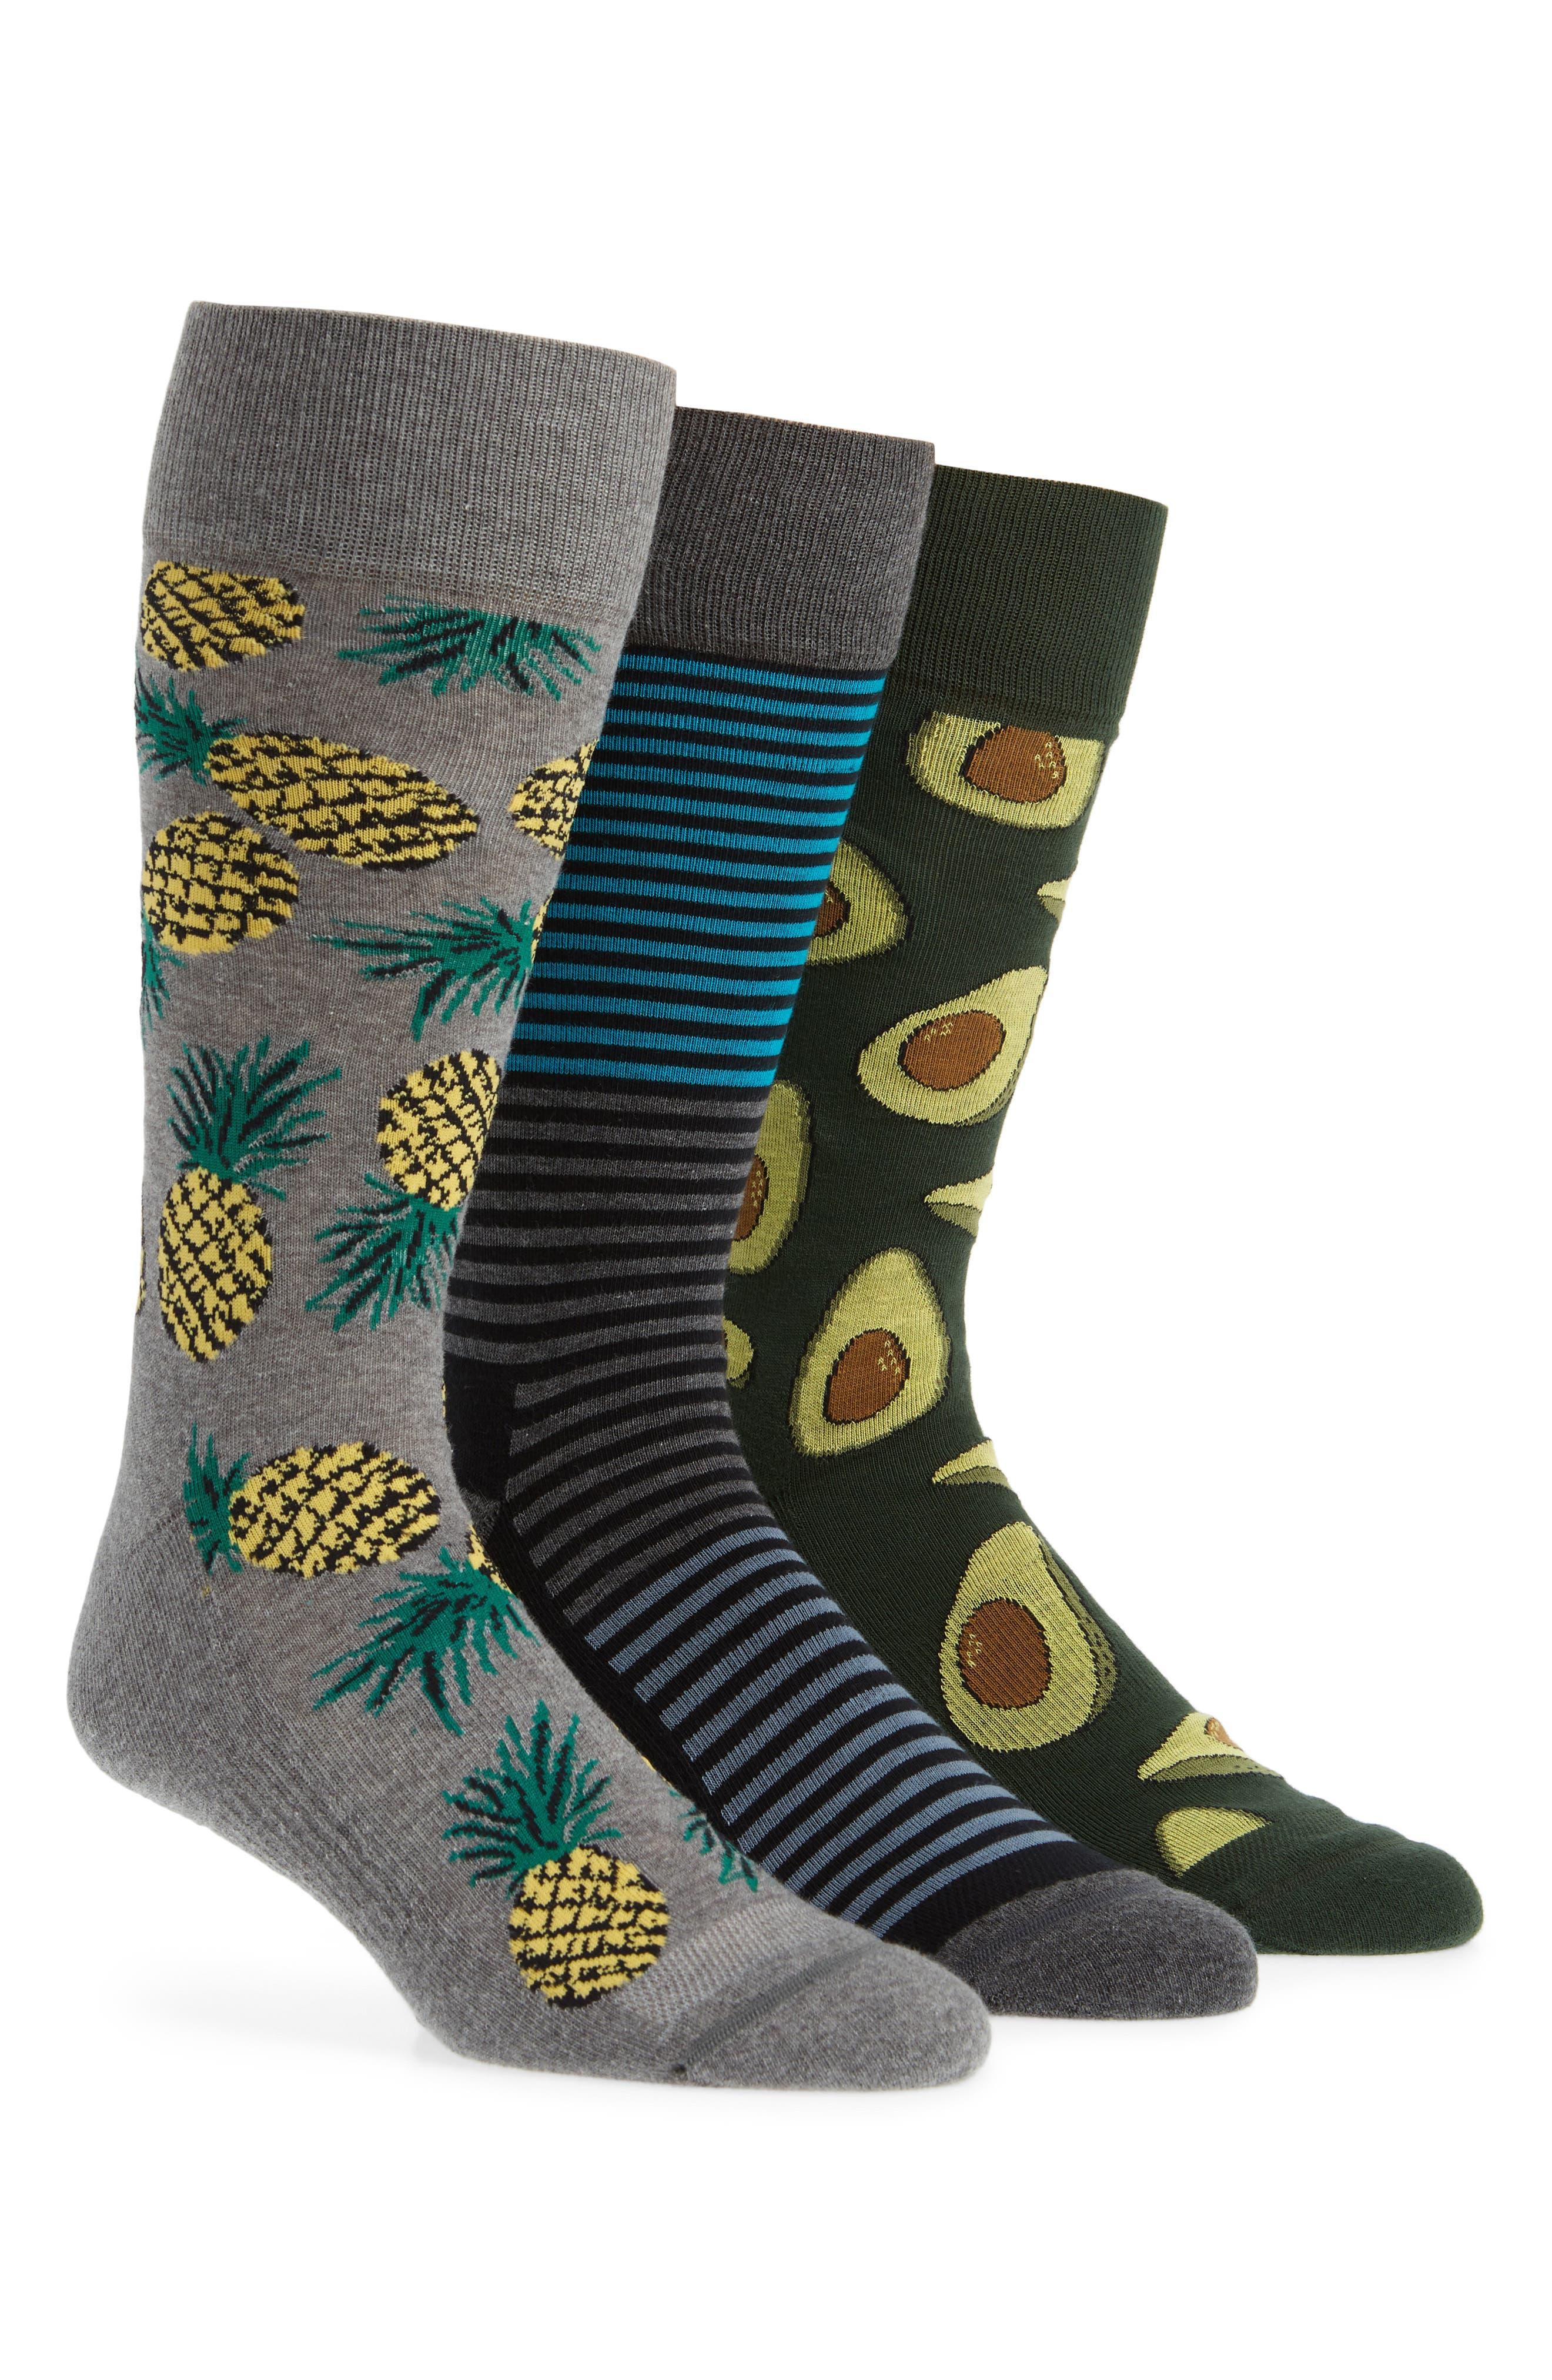 3-Pack Novelty Socks Box Set,                         Main,                         color, AVOCADO/ PINEAPPLE/ STRIPE